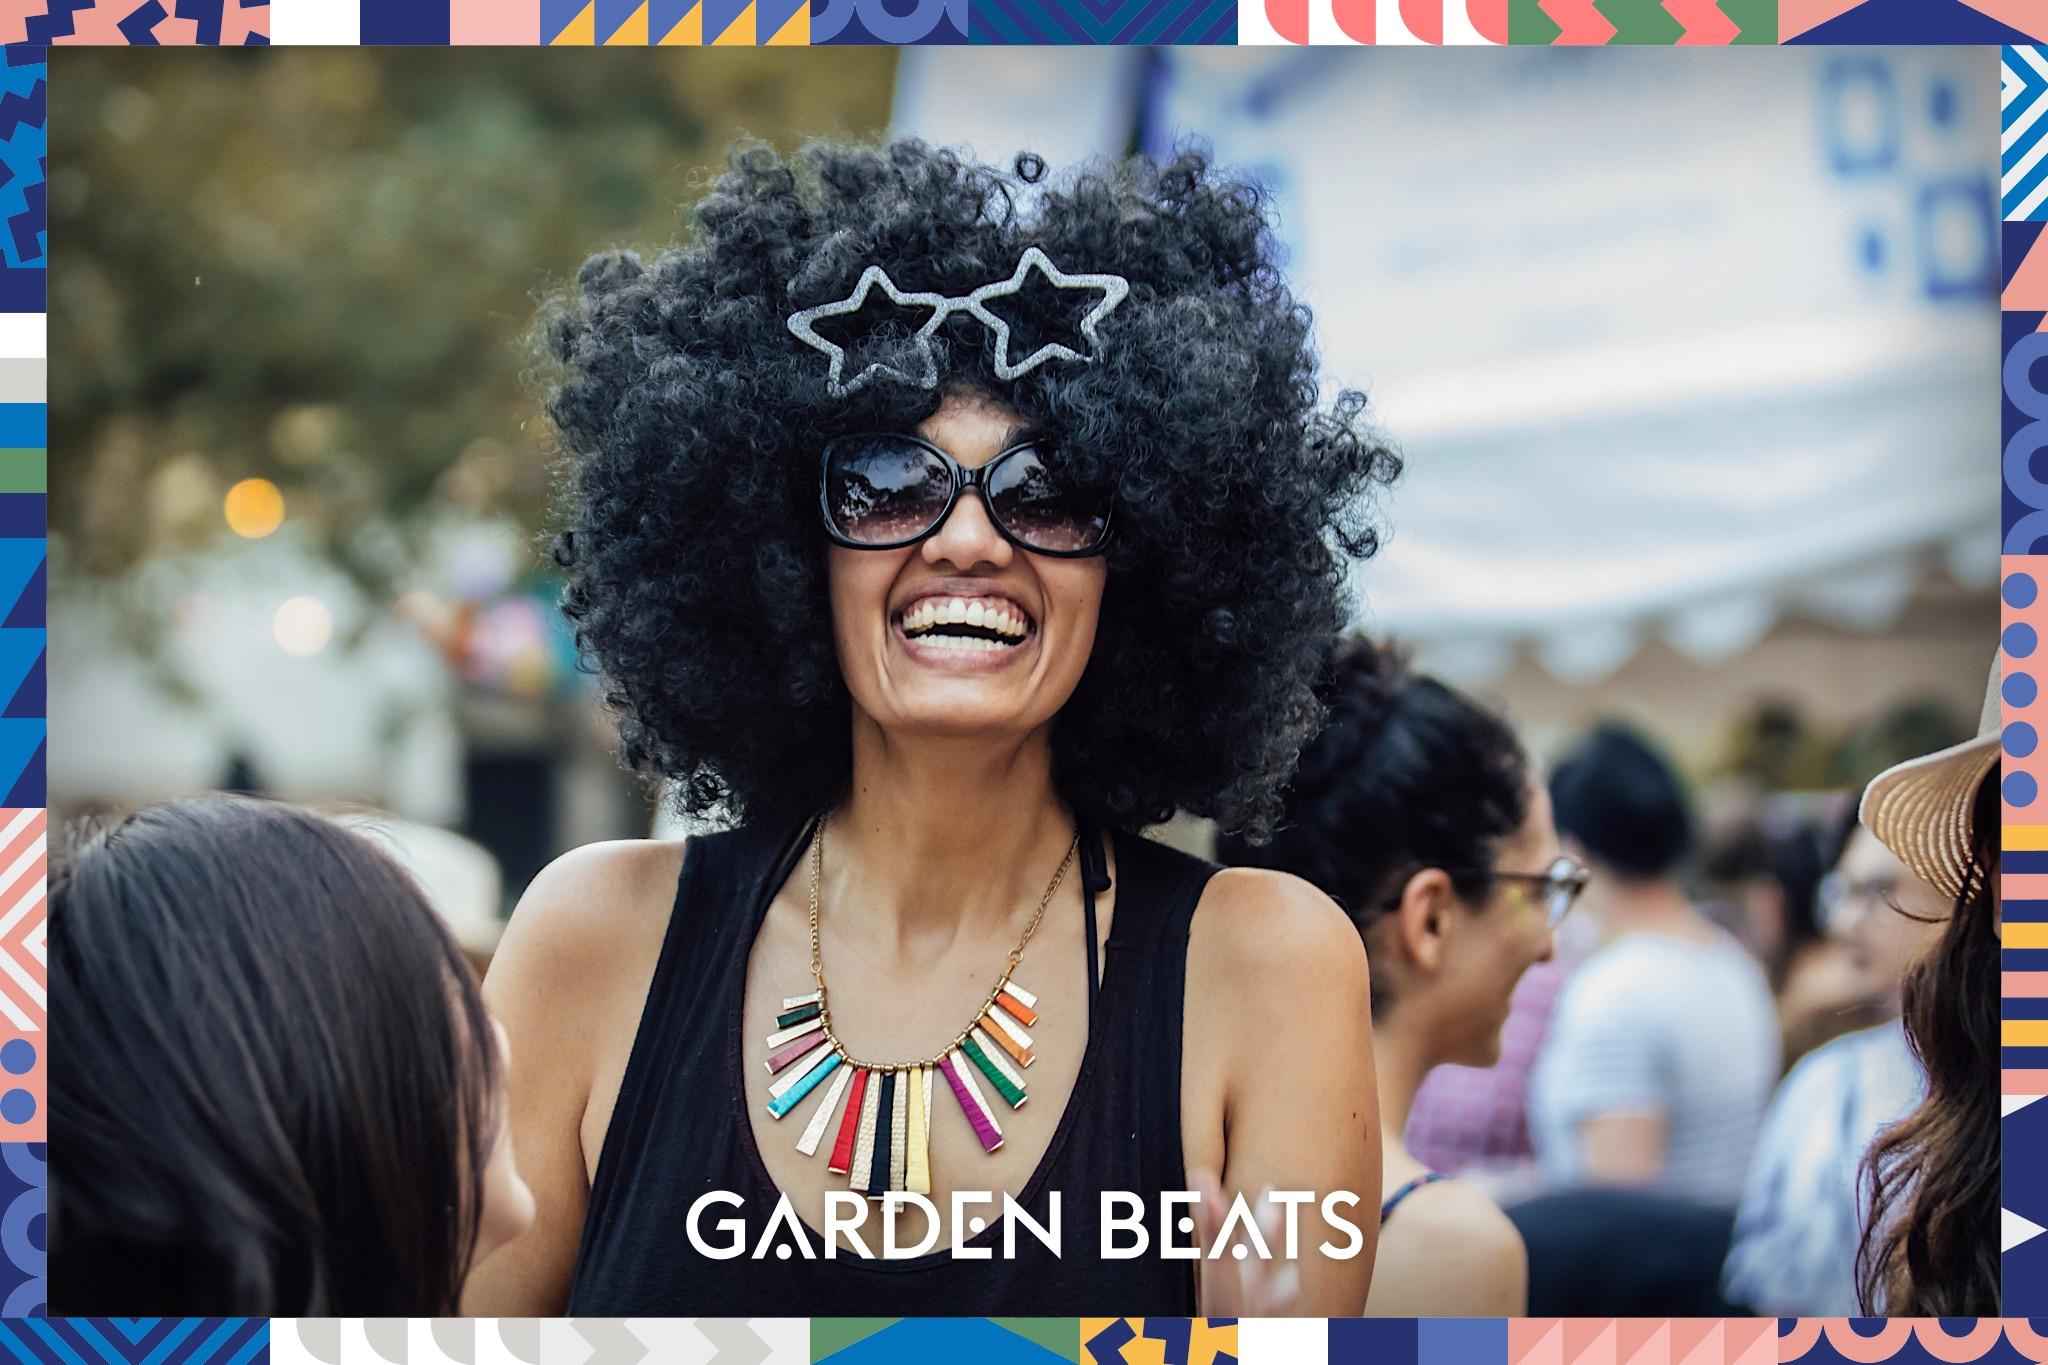 18032017_GardenBeats_Colossal565_WatermarkedGB.jpg